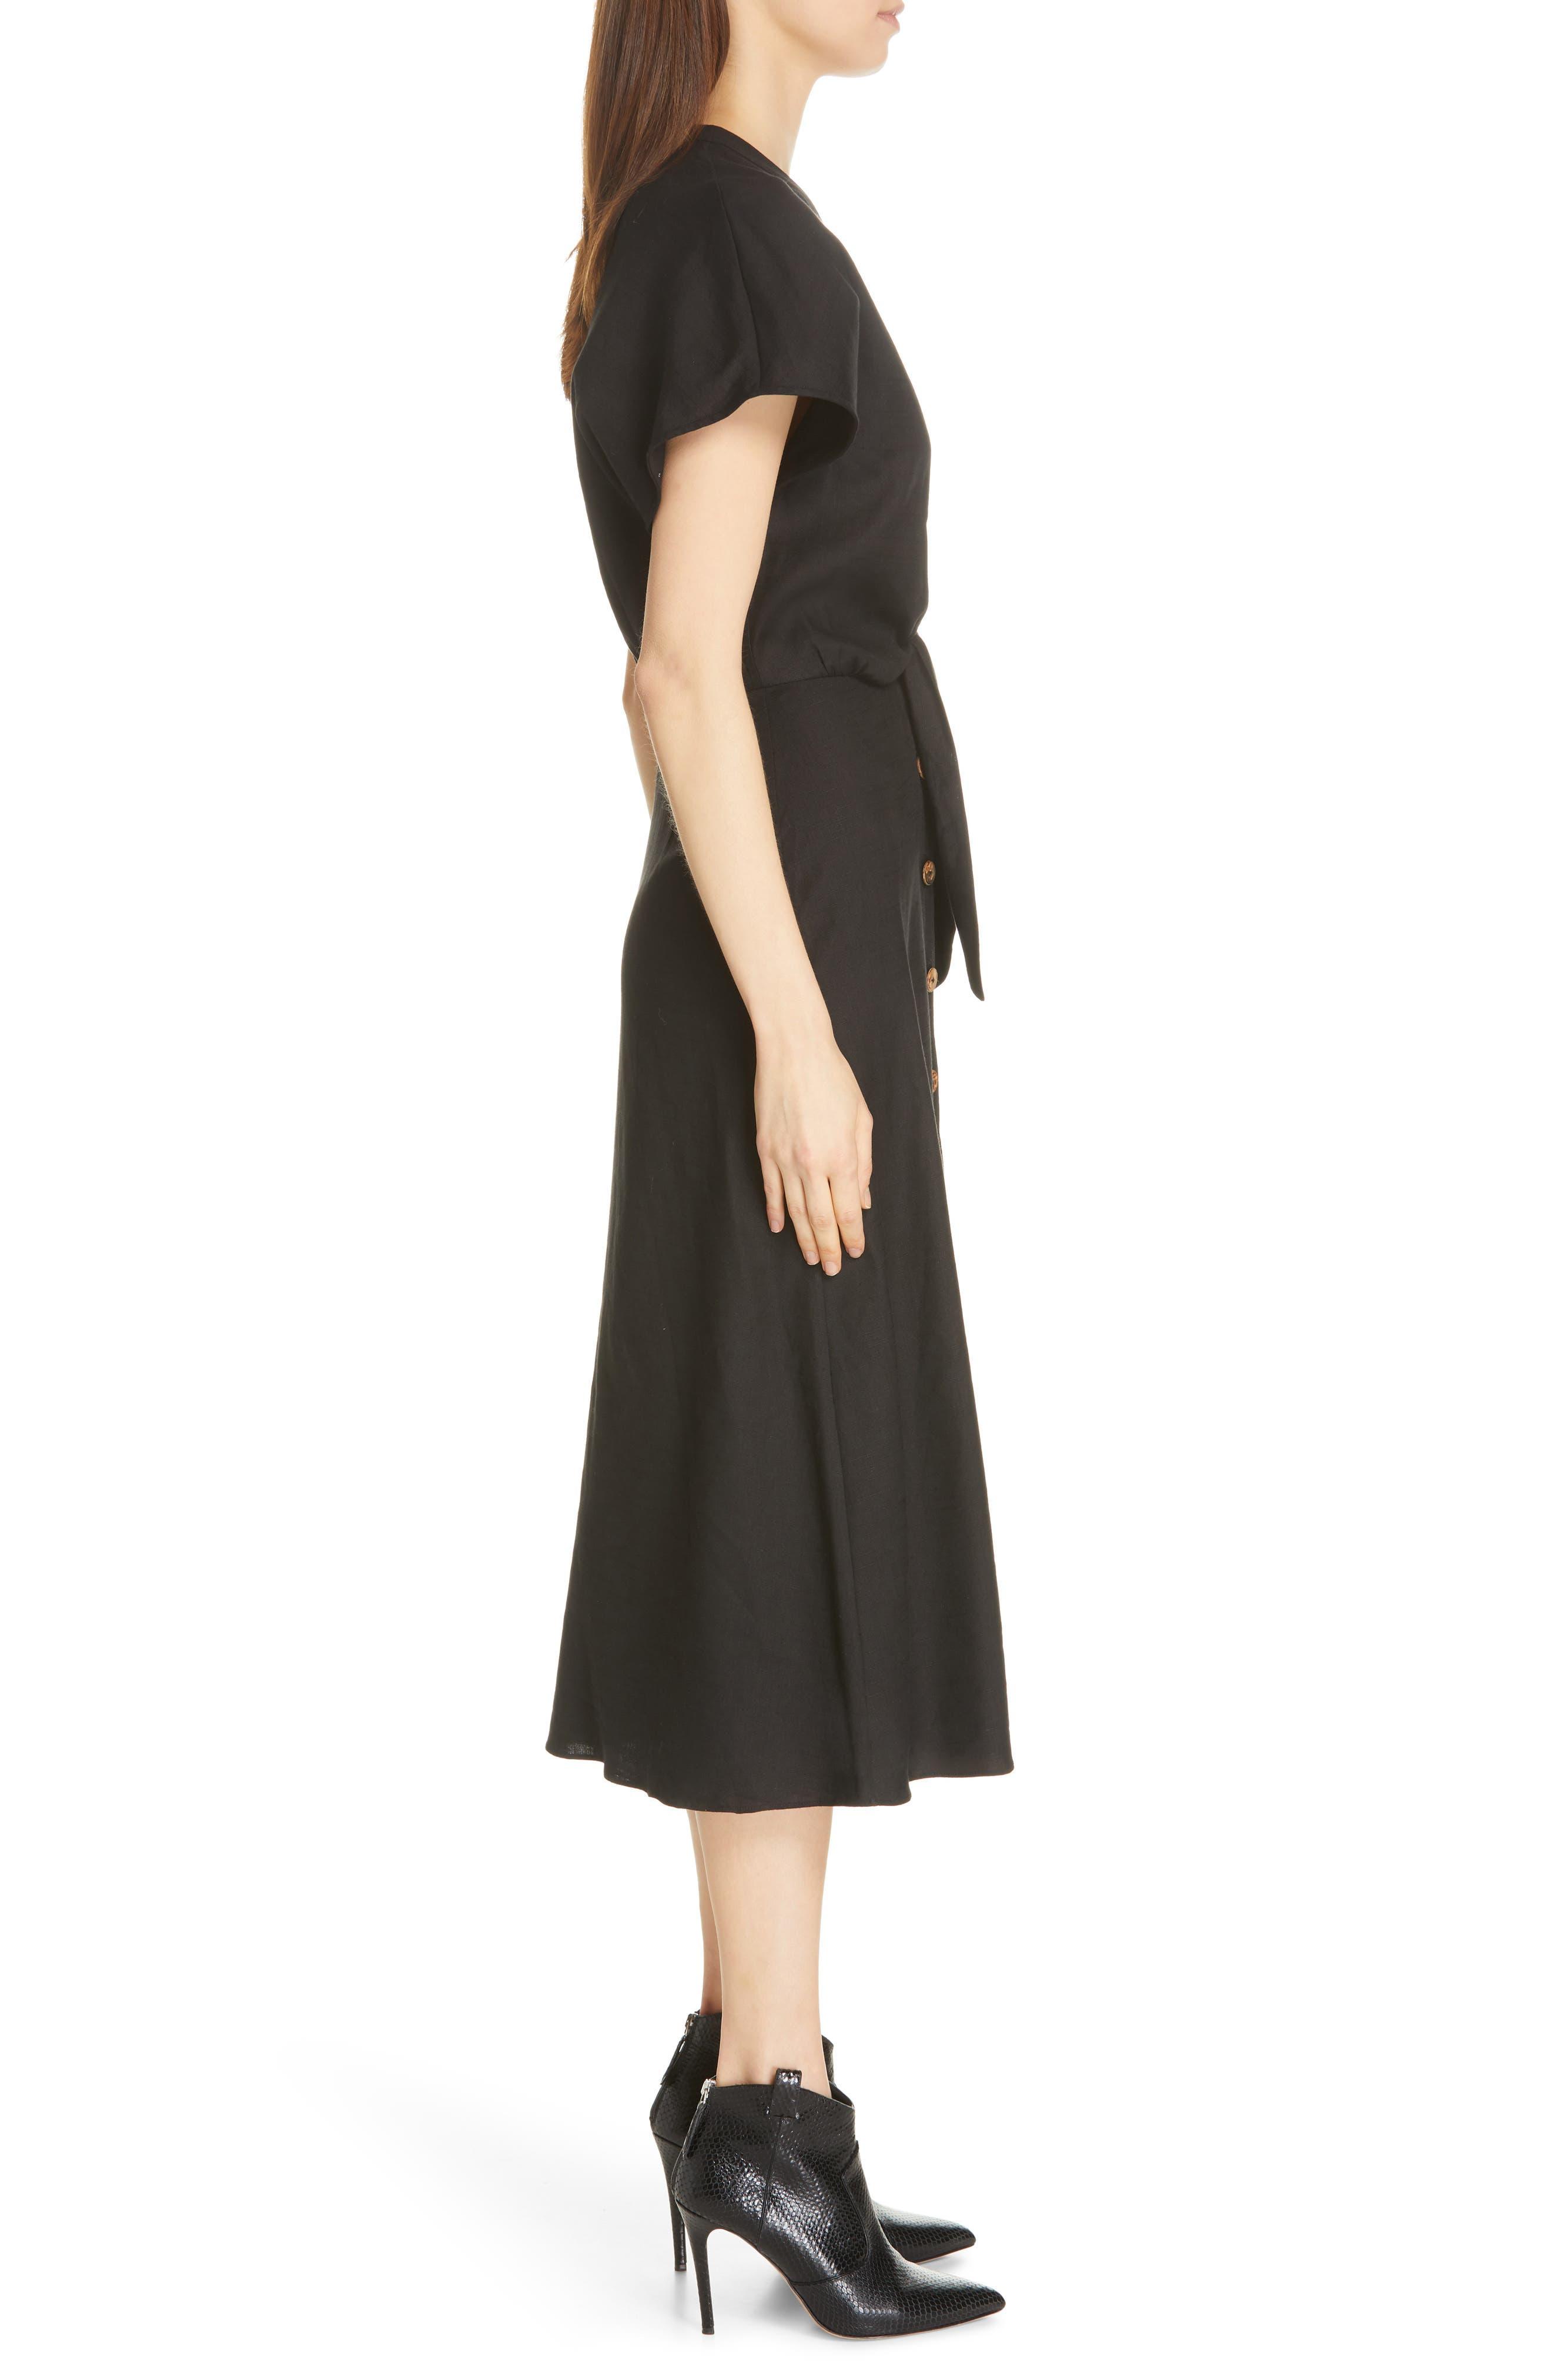 VERONICA BEARD, Giana Tie Waist Linen Blend Midi Dress, Alternate thumbnail 4, color, BLACK